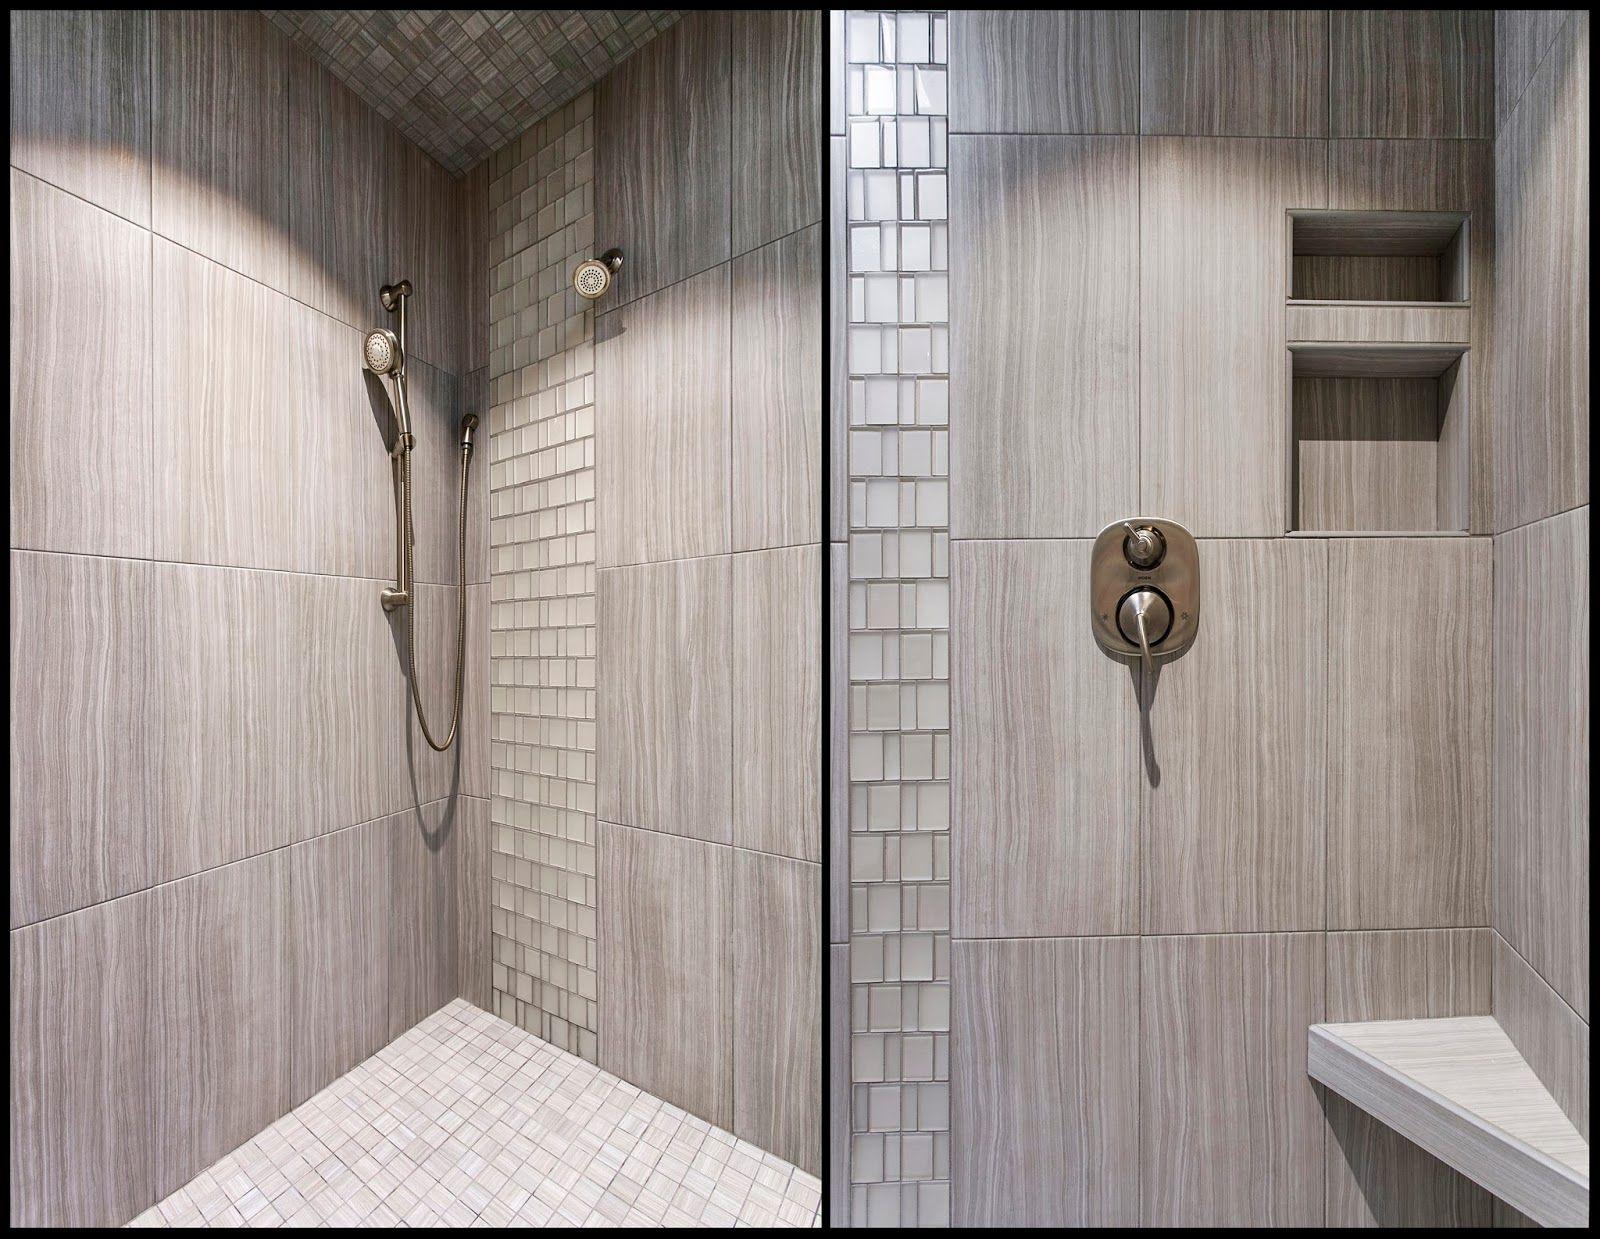 Bathroom Trends 2017 / 2018 | ideas | Pinterest | 12x24 tile, Soap ...